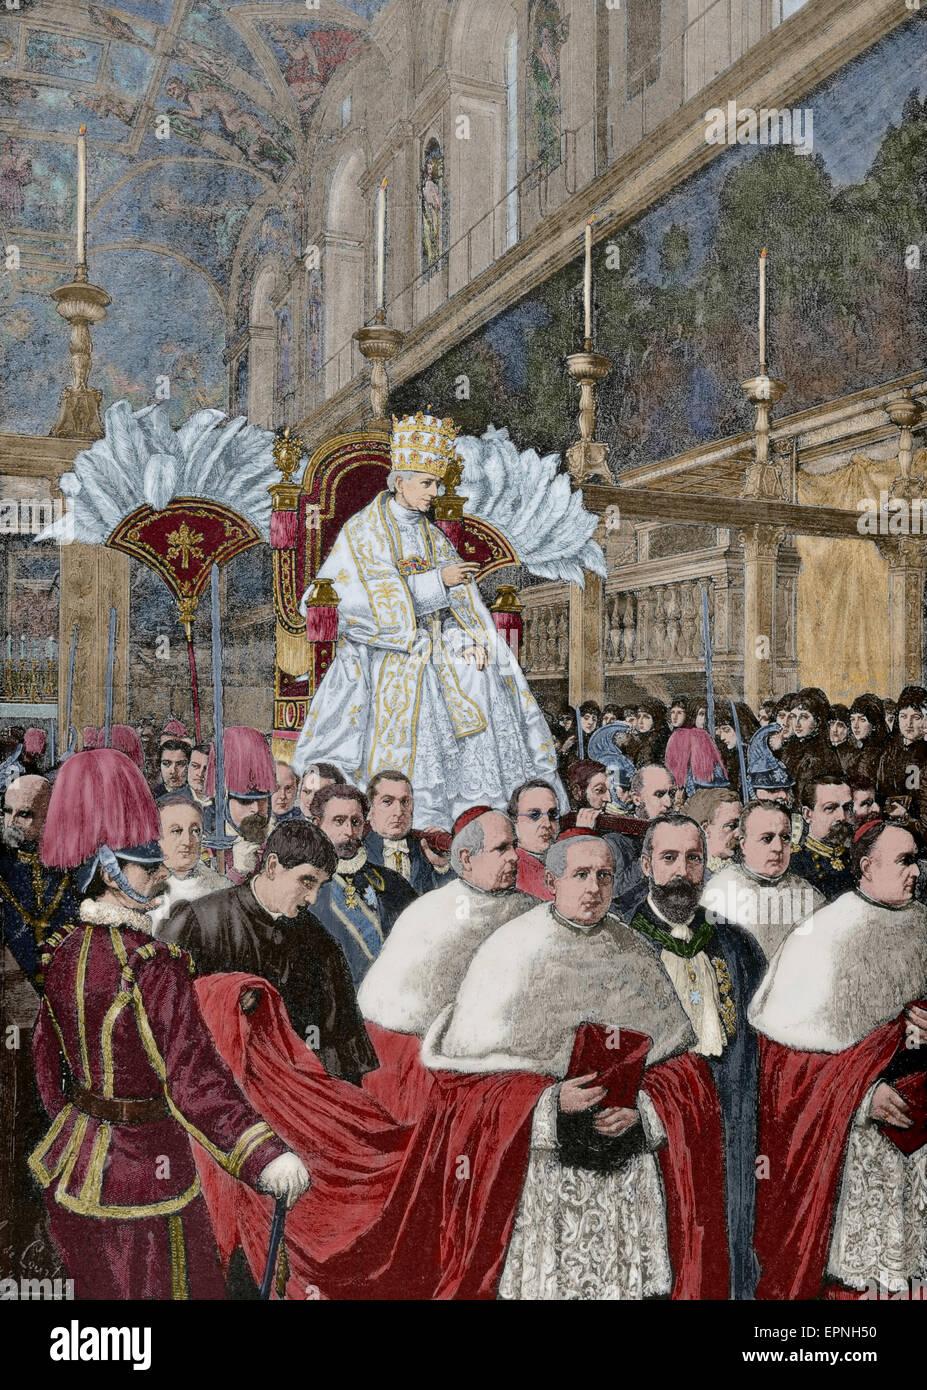 leo xiii 1810 1903 italian pope 1878 1903 named. Black Bedroom Furniture Sets. Home Design Ideas